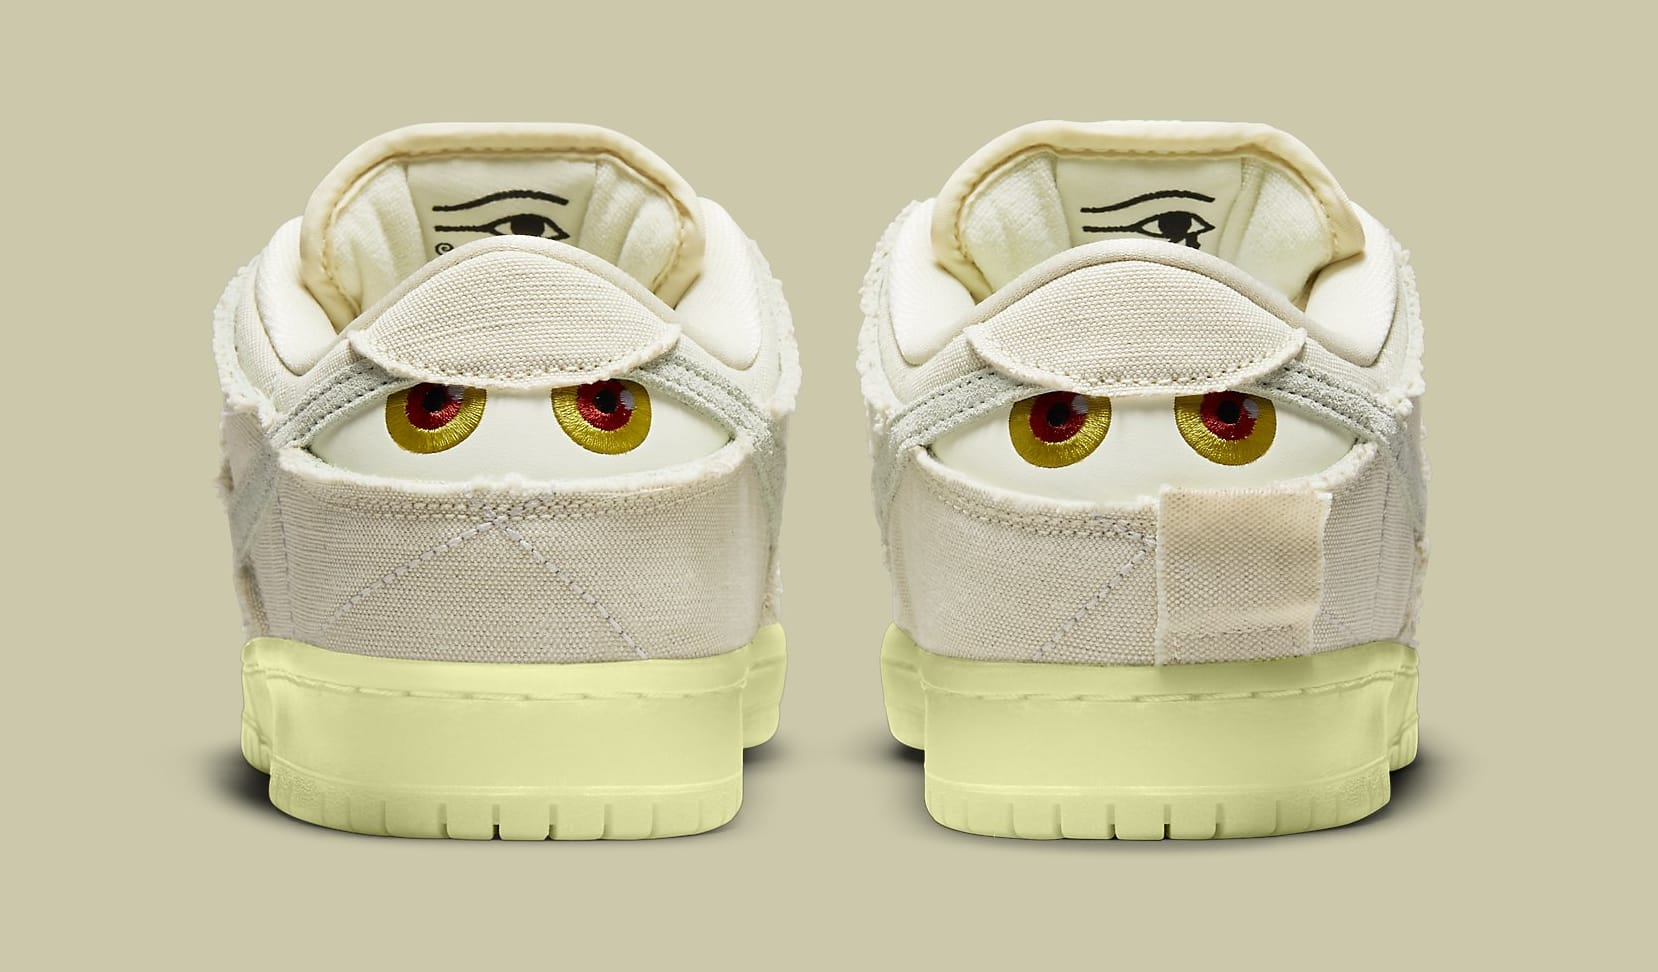 Nike SB Dunk Low 'Mummy' DM0774-111 Heel